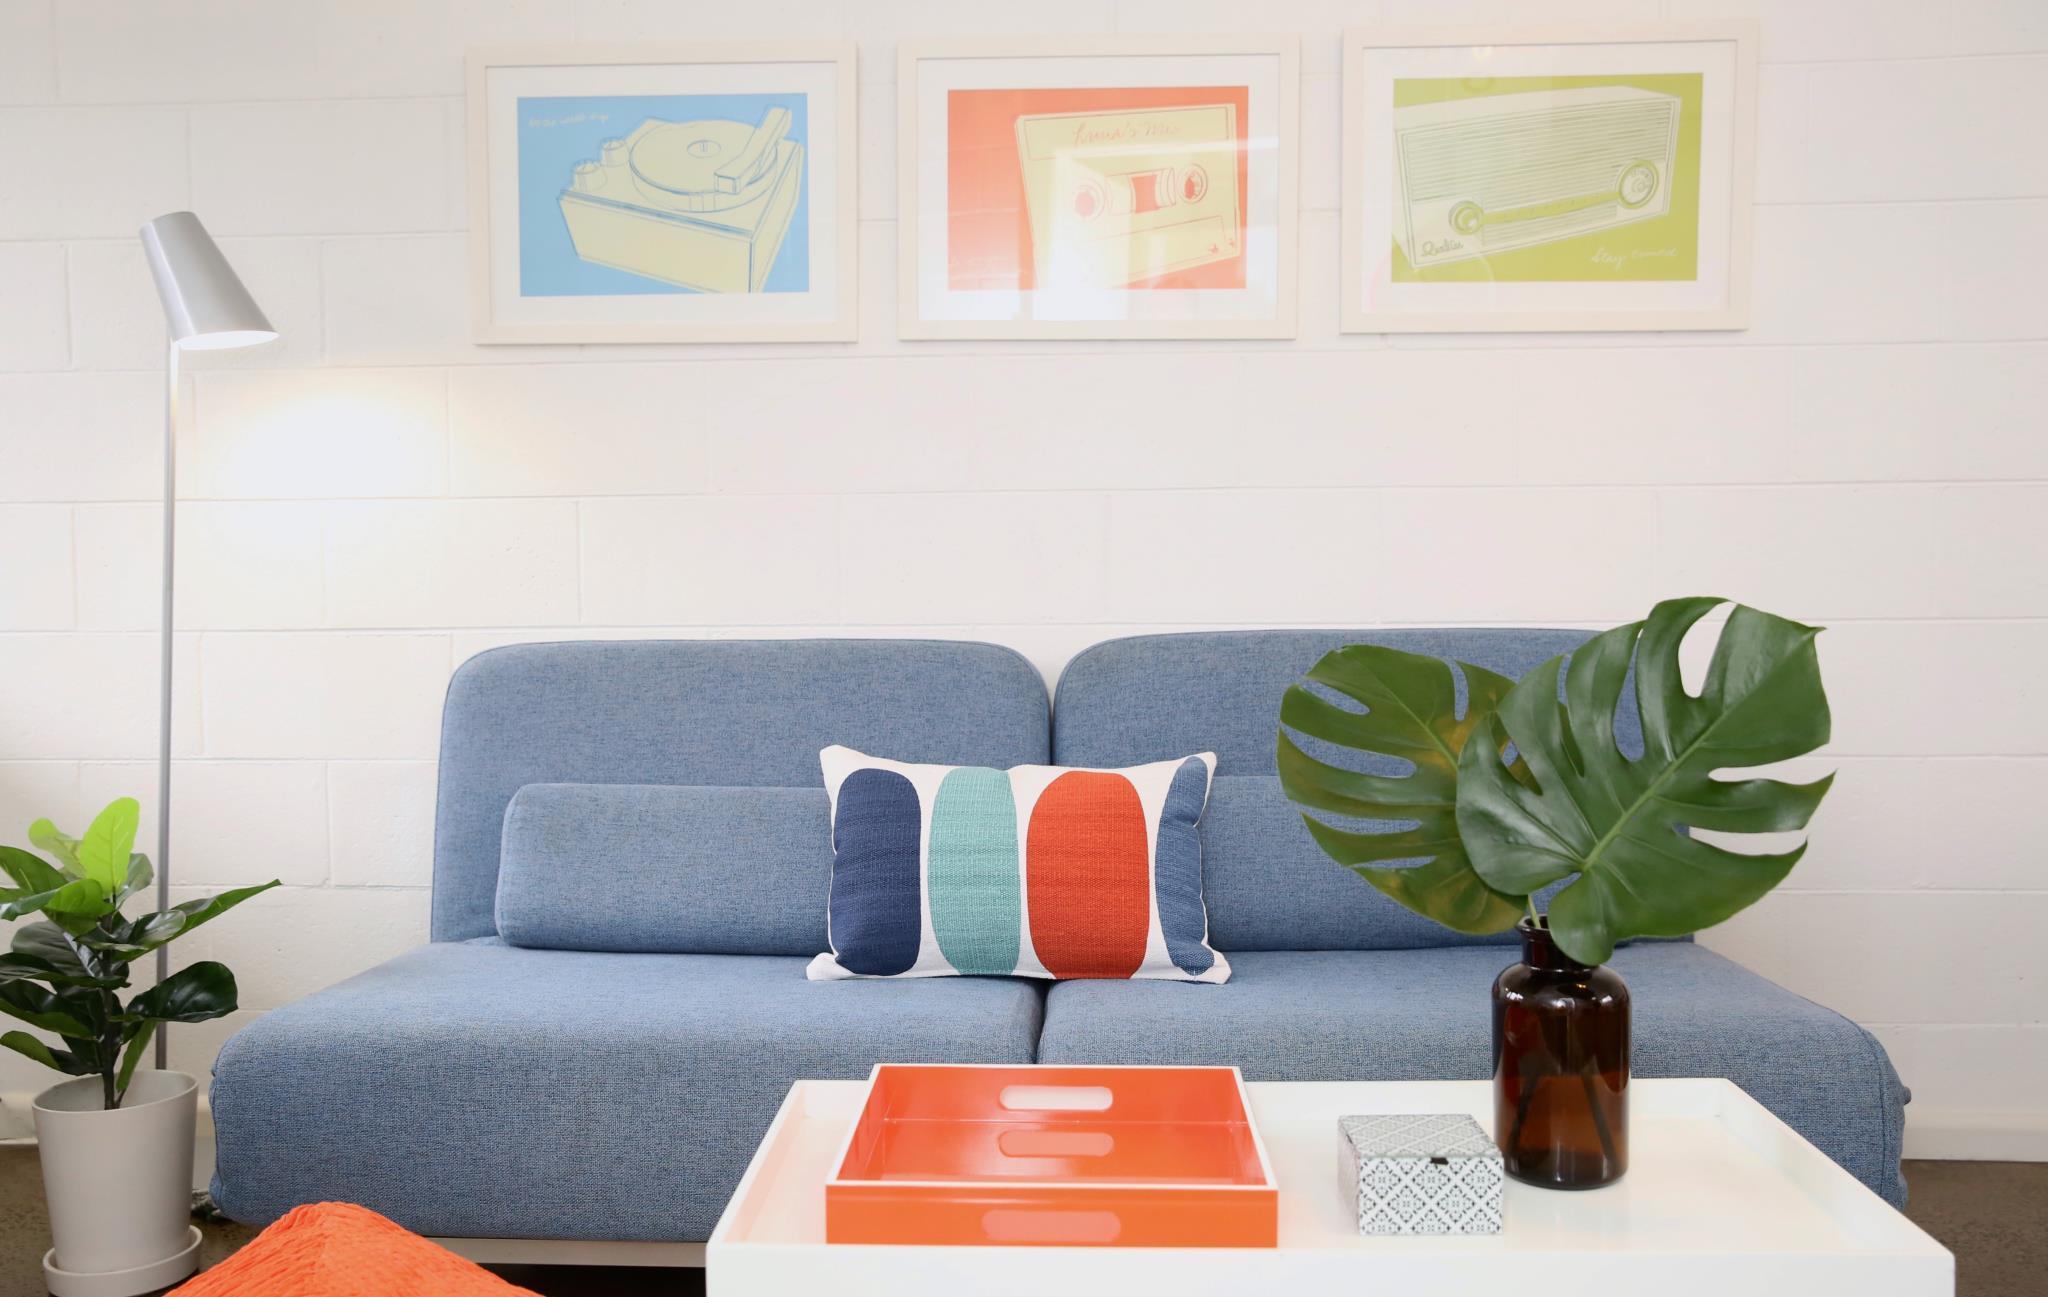 melbourne yarra valley wine and wildlife self driving tour. Black Bedroom Furniture Sets. Home Design Ideas